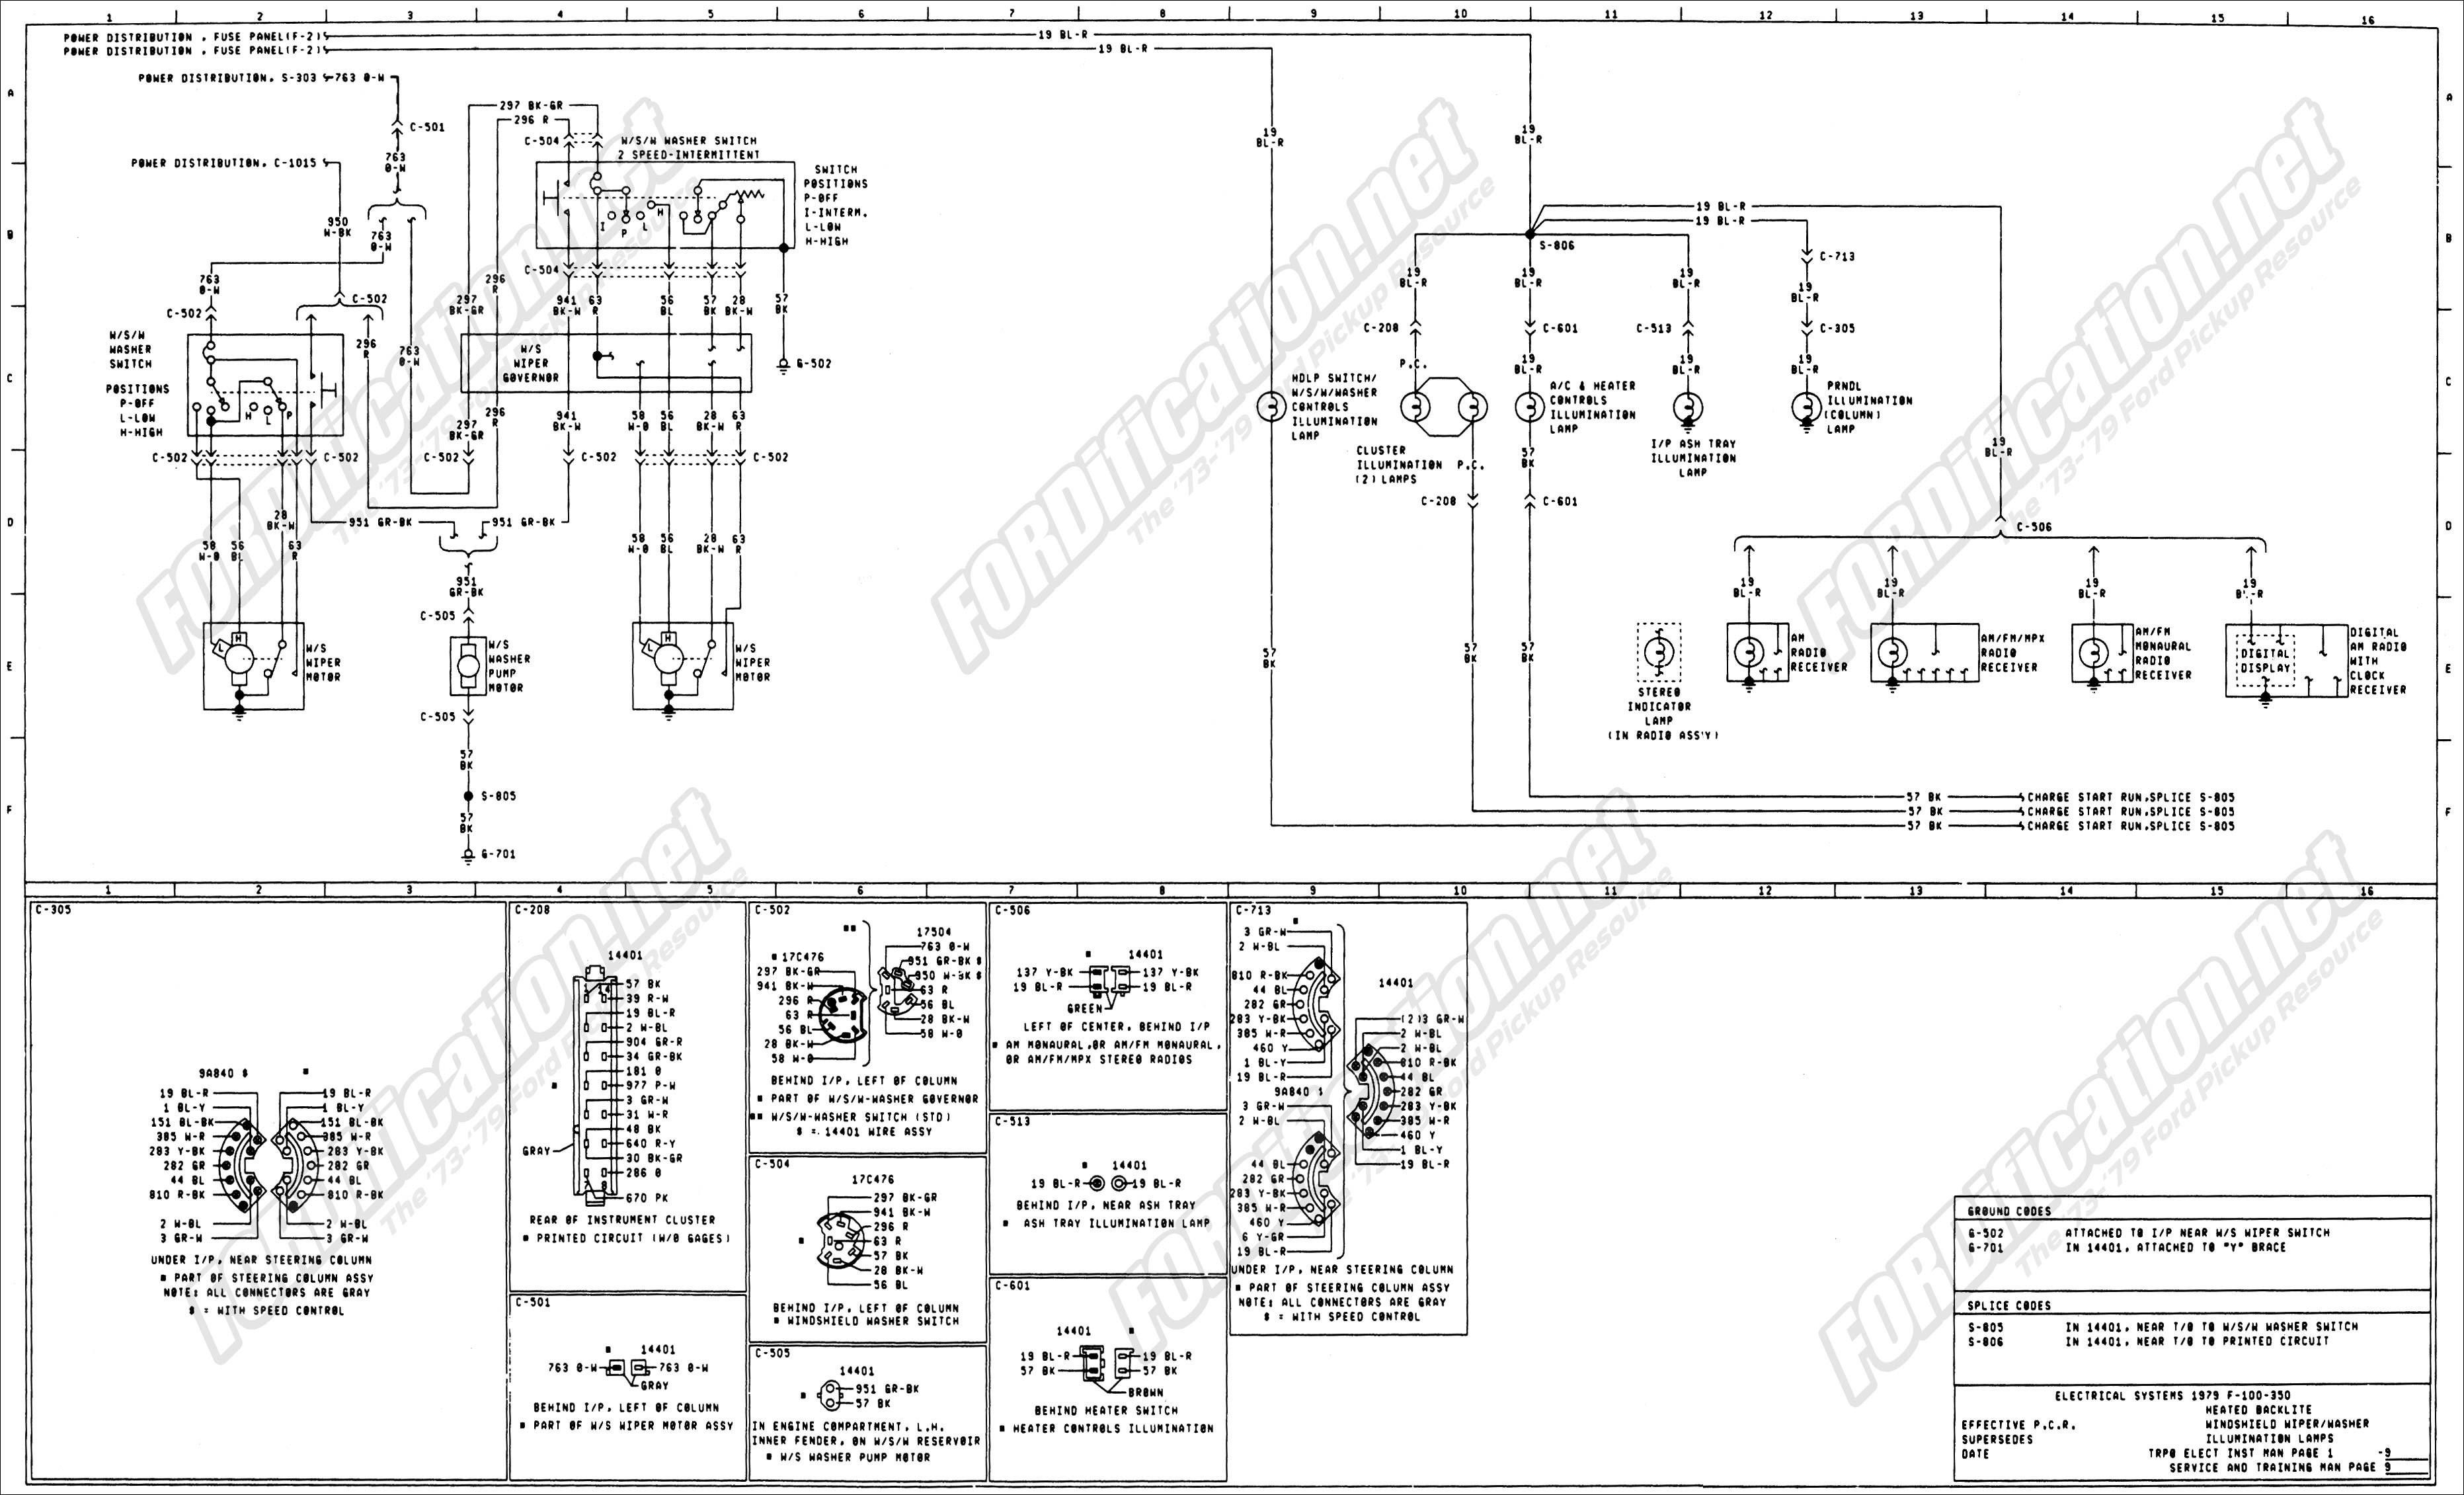 1997 ford F150 Wiring Diagram 97 F150 Starter Wiring Diagram Arcnx Of 1997 ford F150 Wiring Diagram